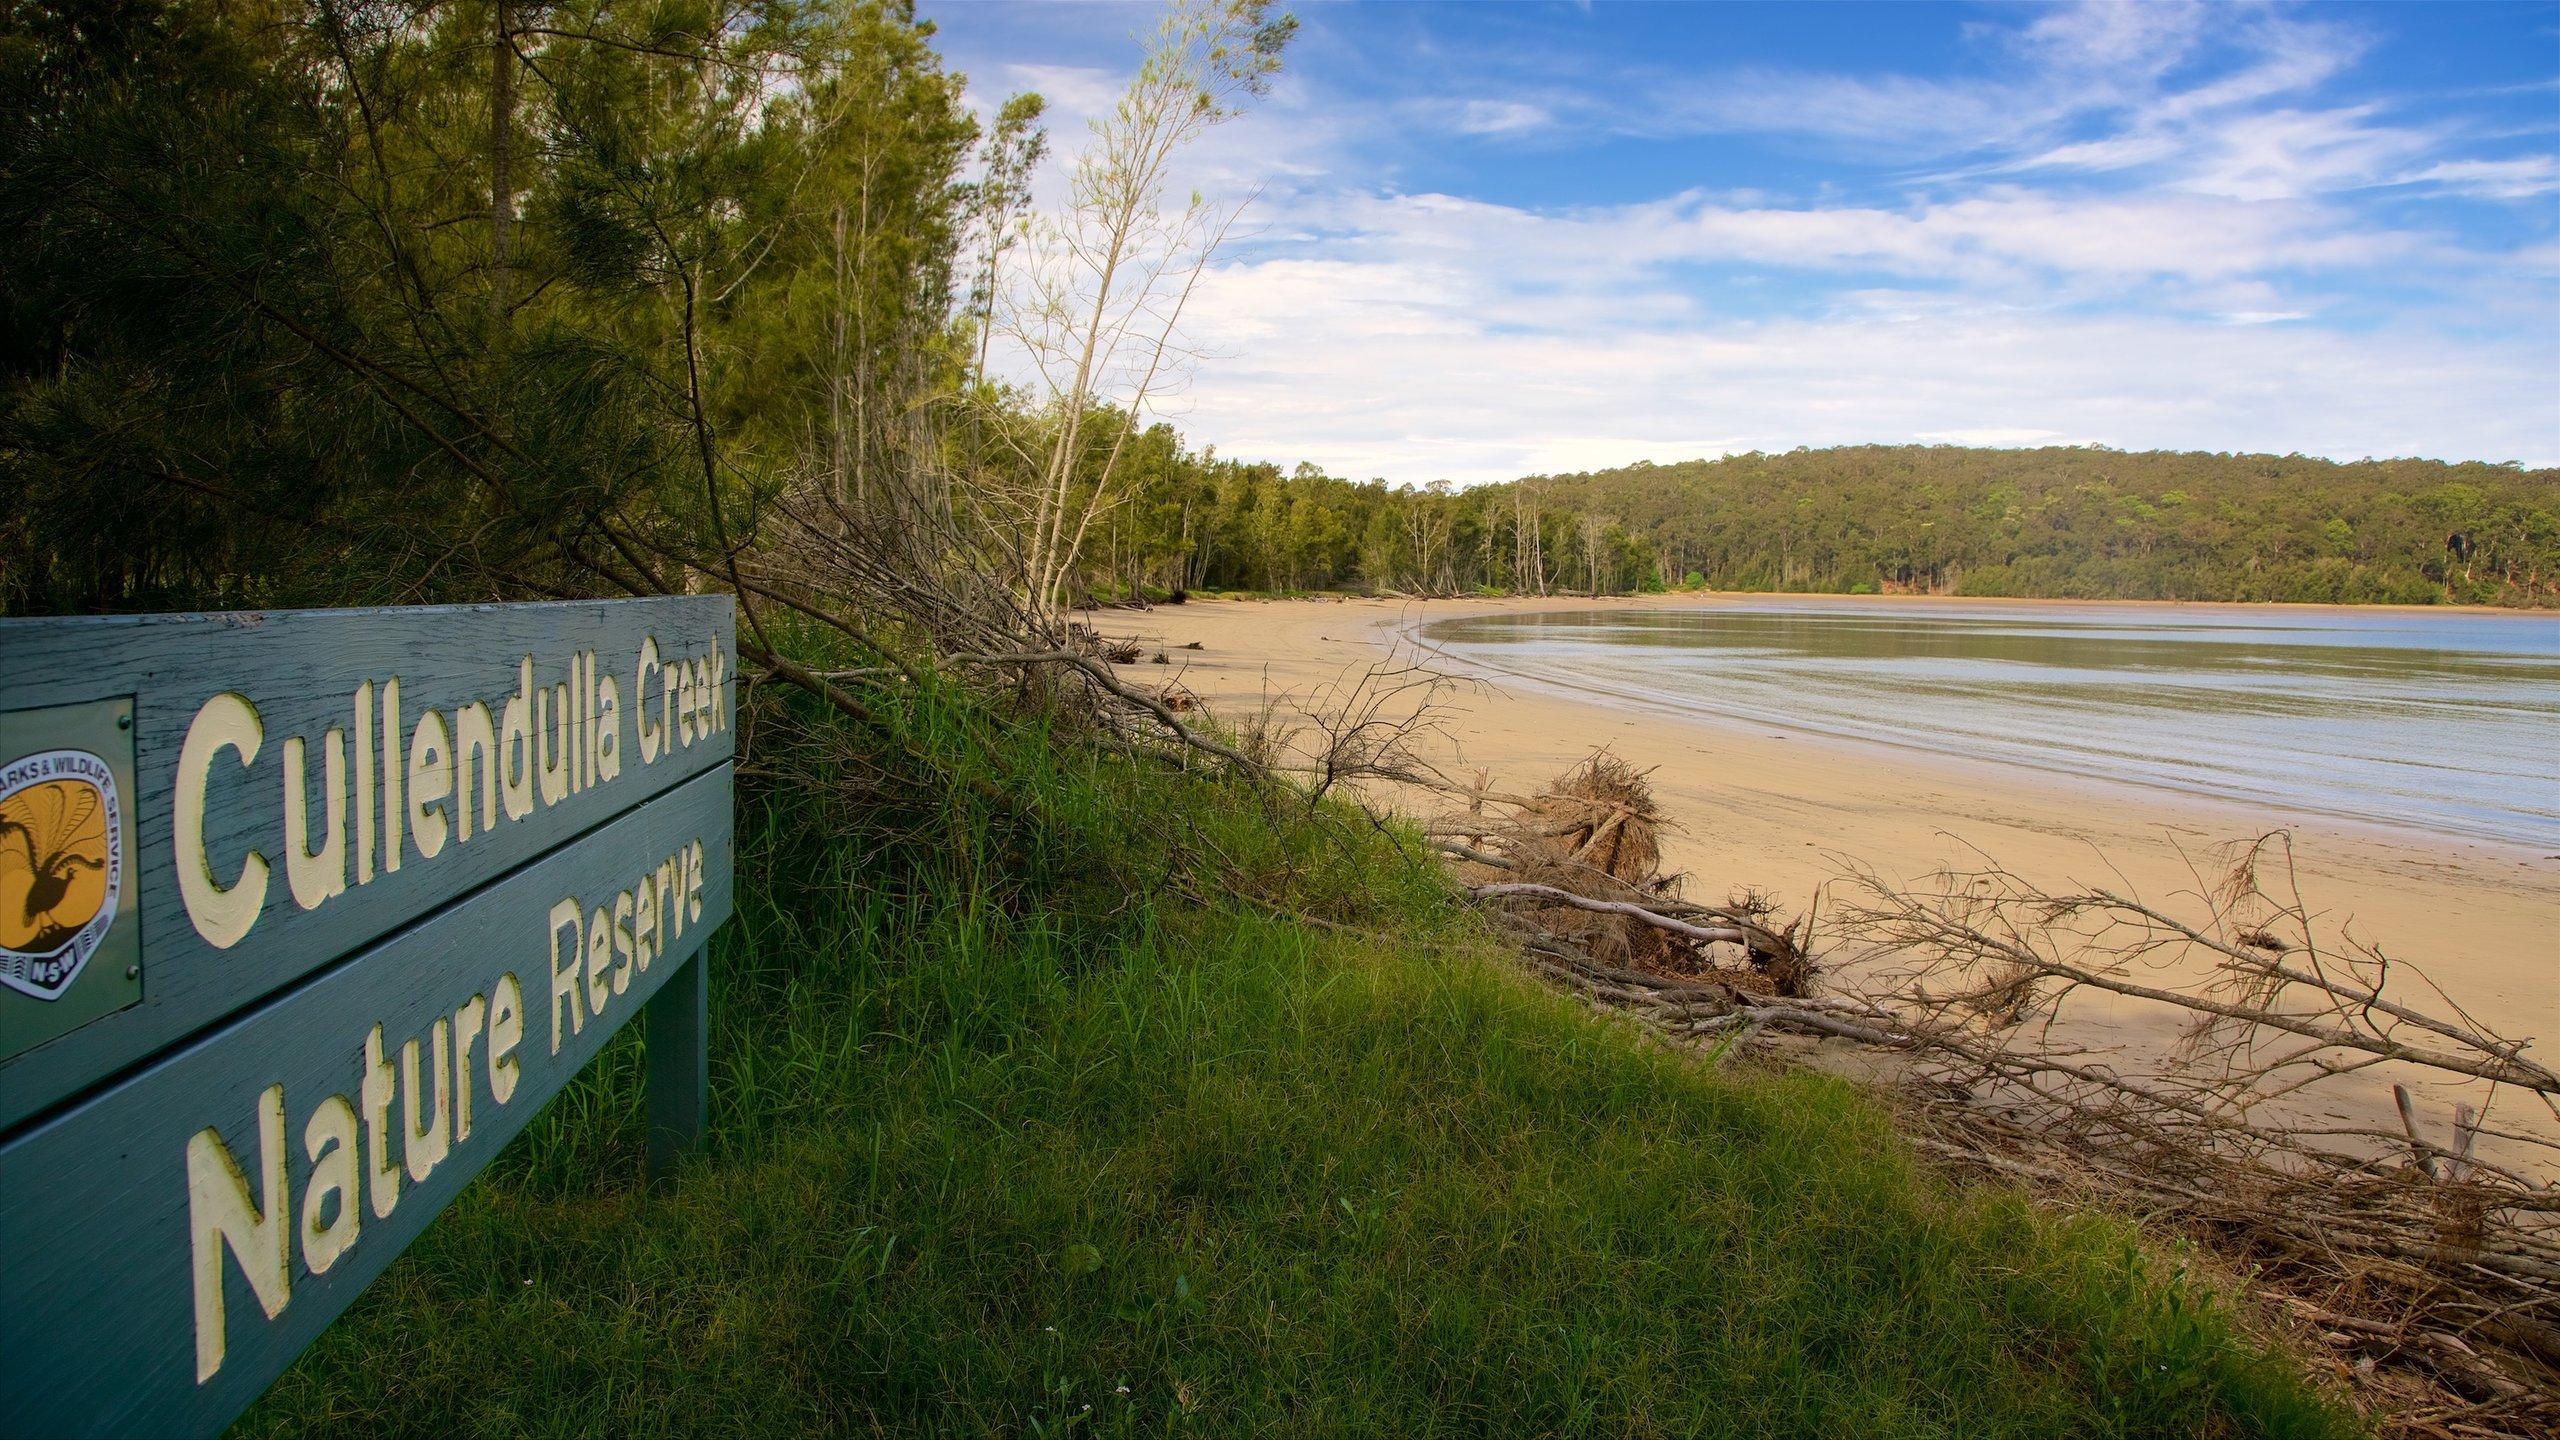 Cullendulla Creek Nature Reserve, Surfside, New South Wales, Australien